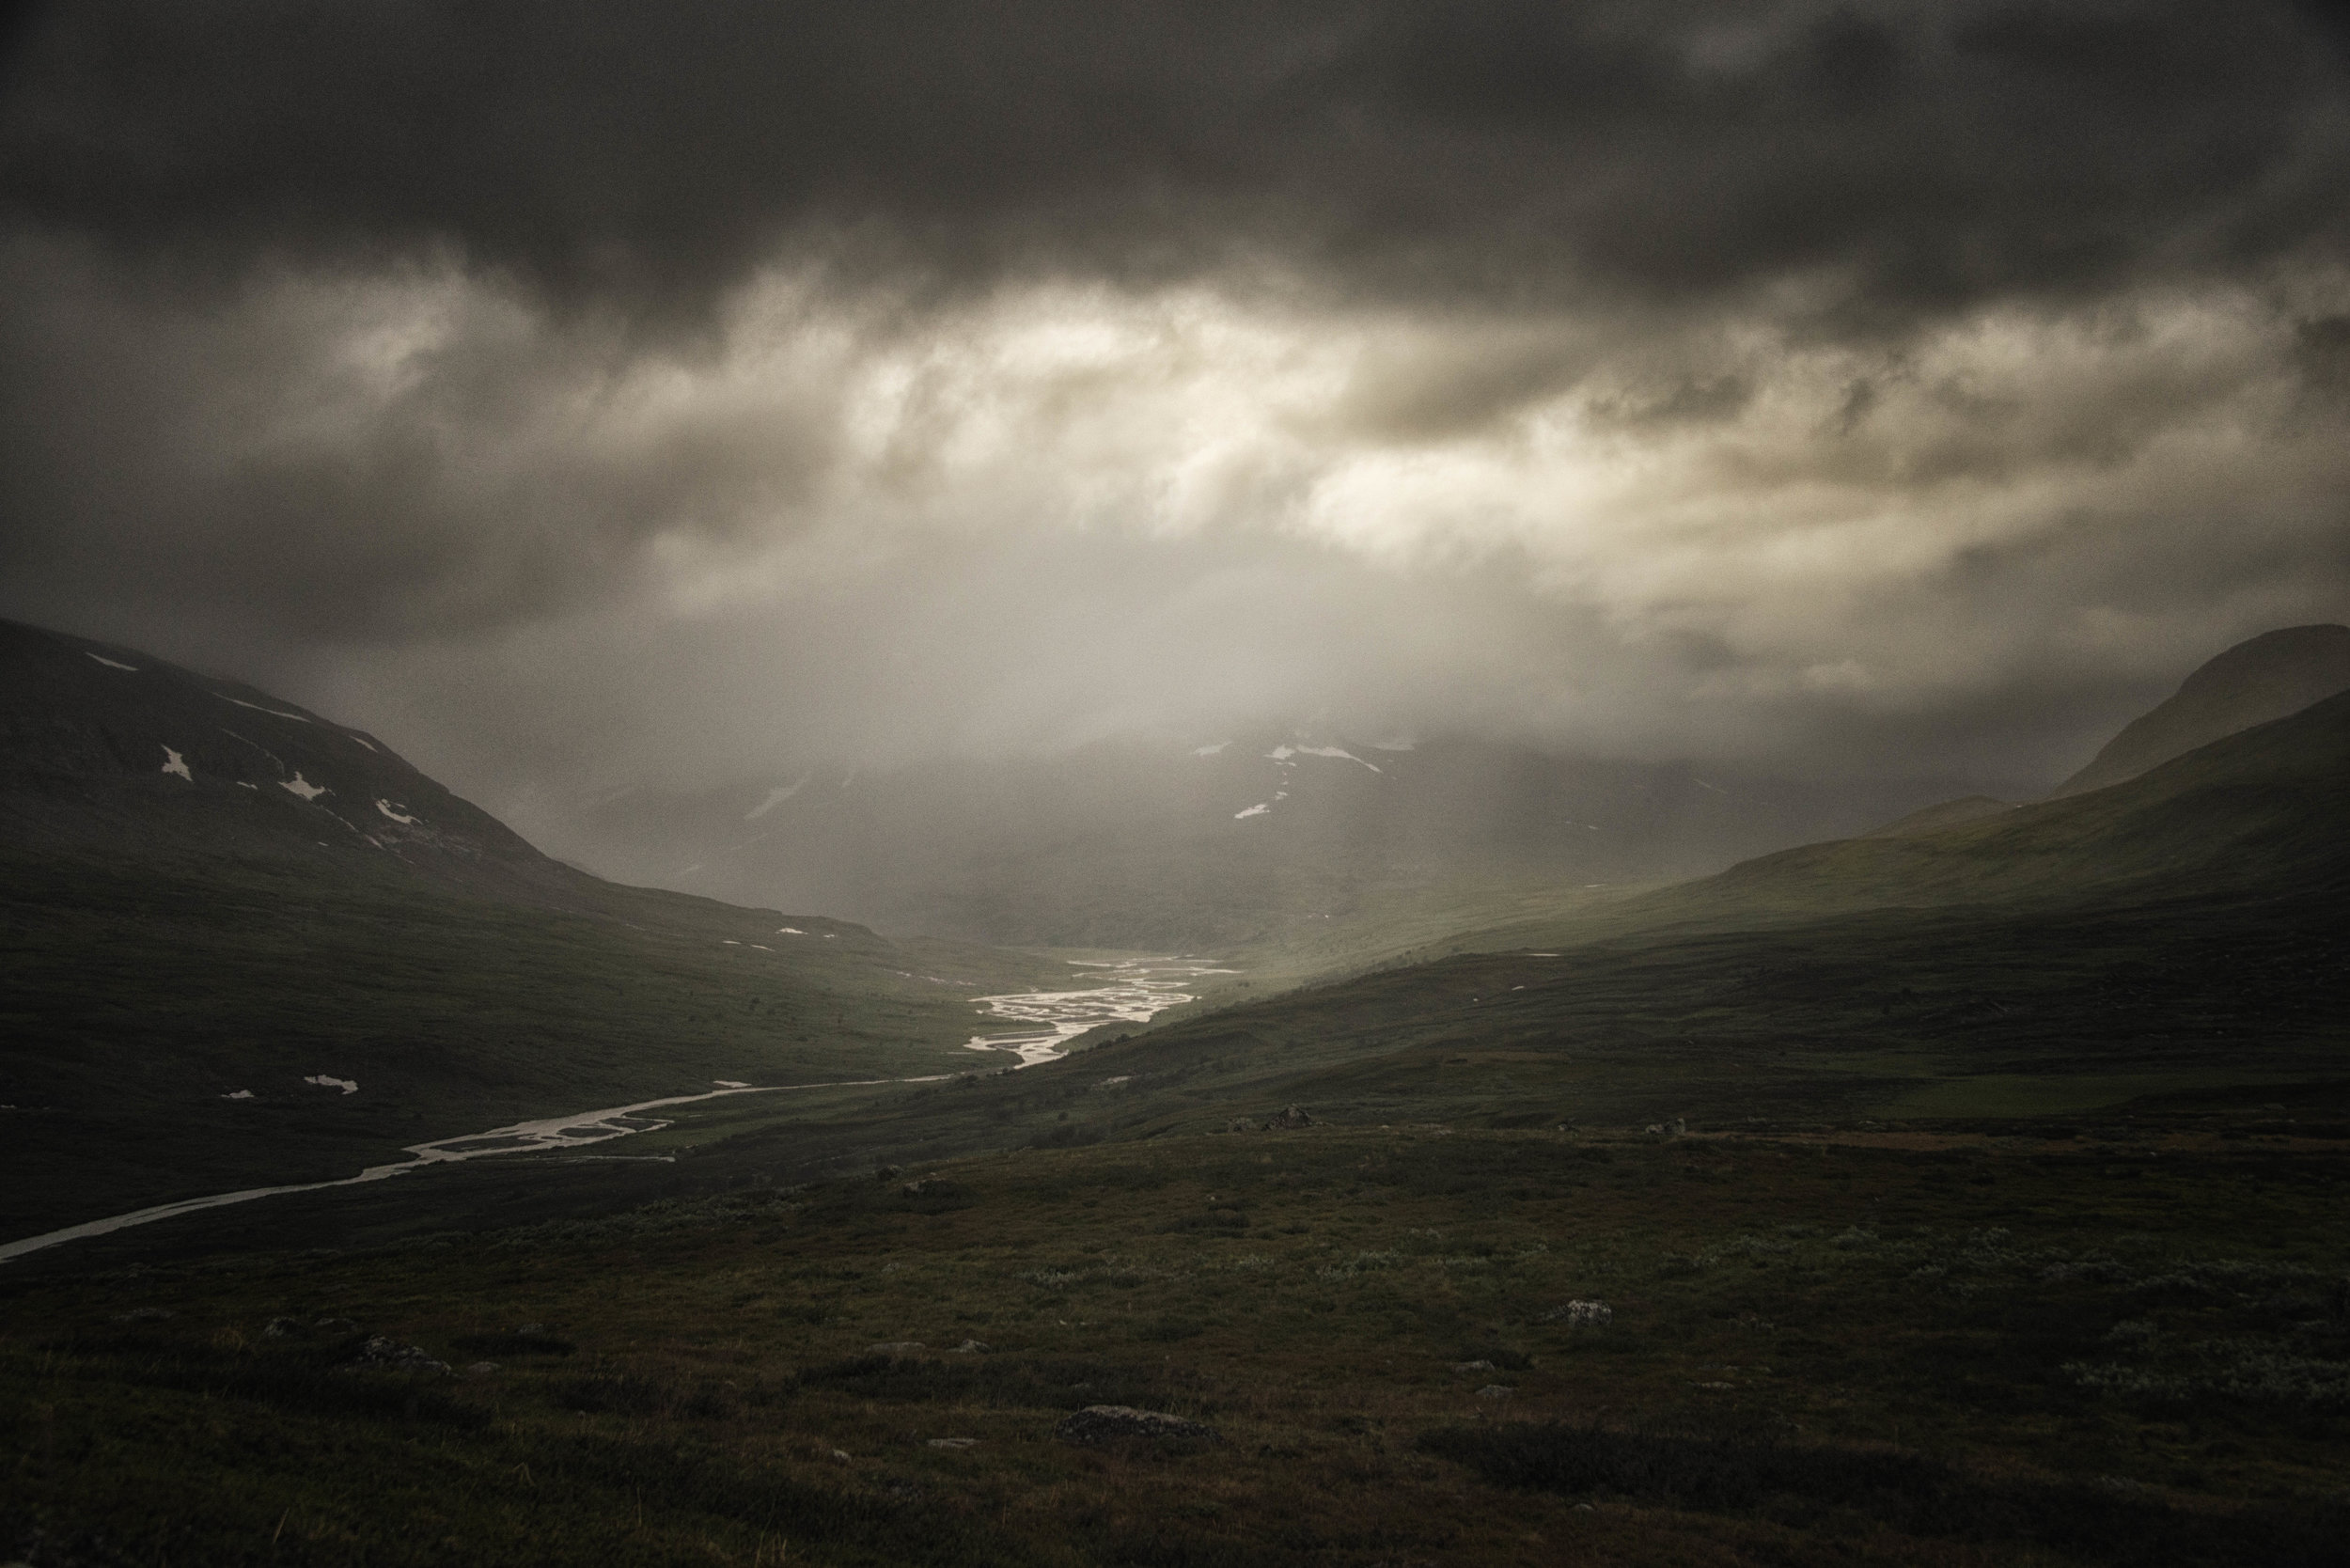 Rain-in-the-mountains.jpg